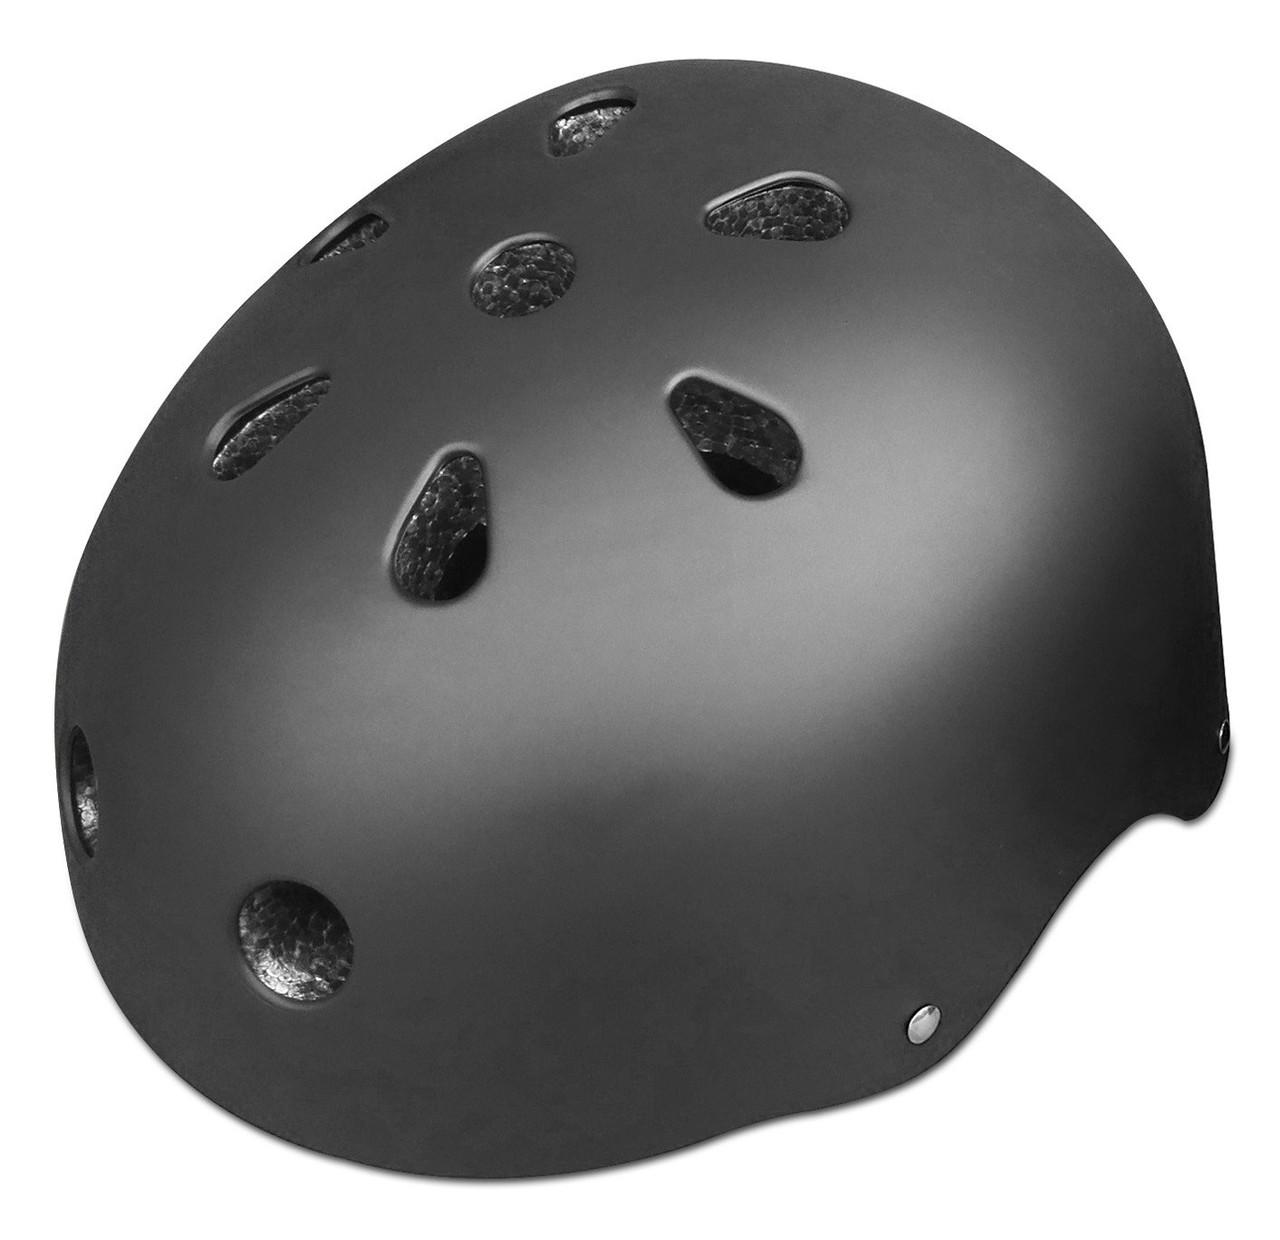 Защитный шлем Rover HJ0-04 (M) Черный матовый (361436)